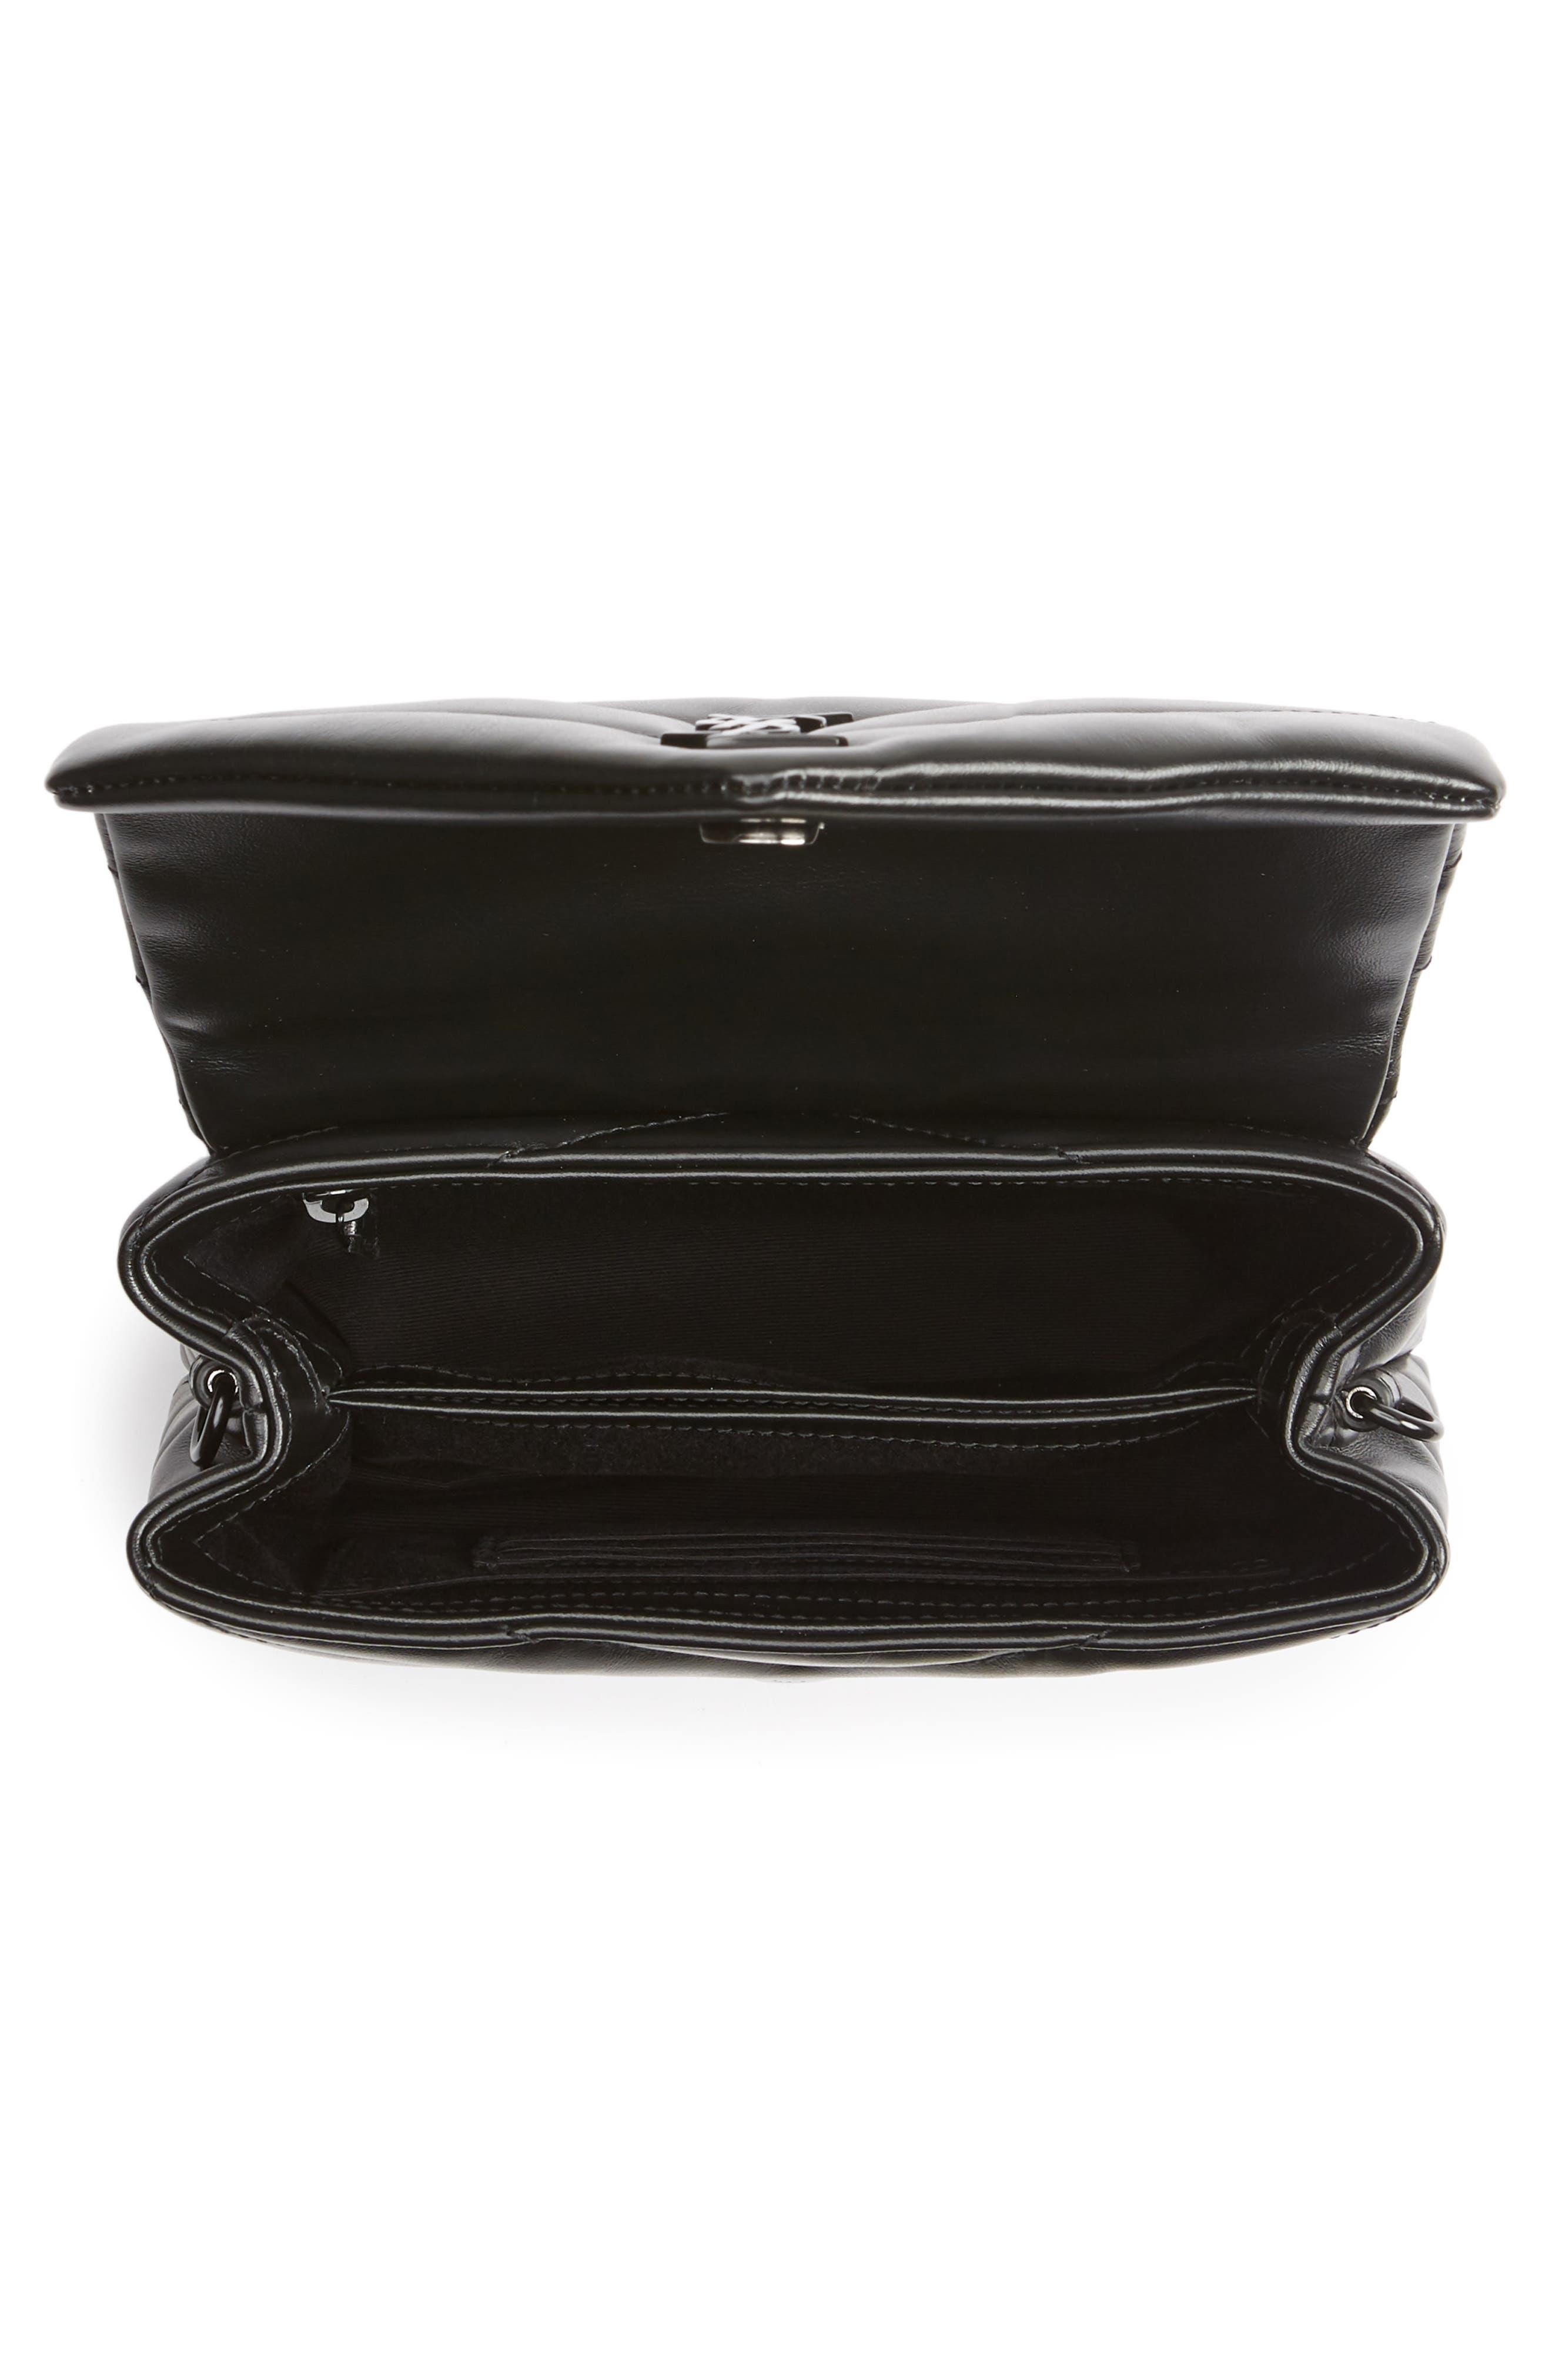 SAINT LAURENT, Toy Loulou Leather Crossbody Bag, Alternate thumbnail 4, color, 001